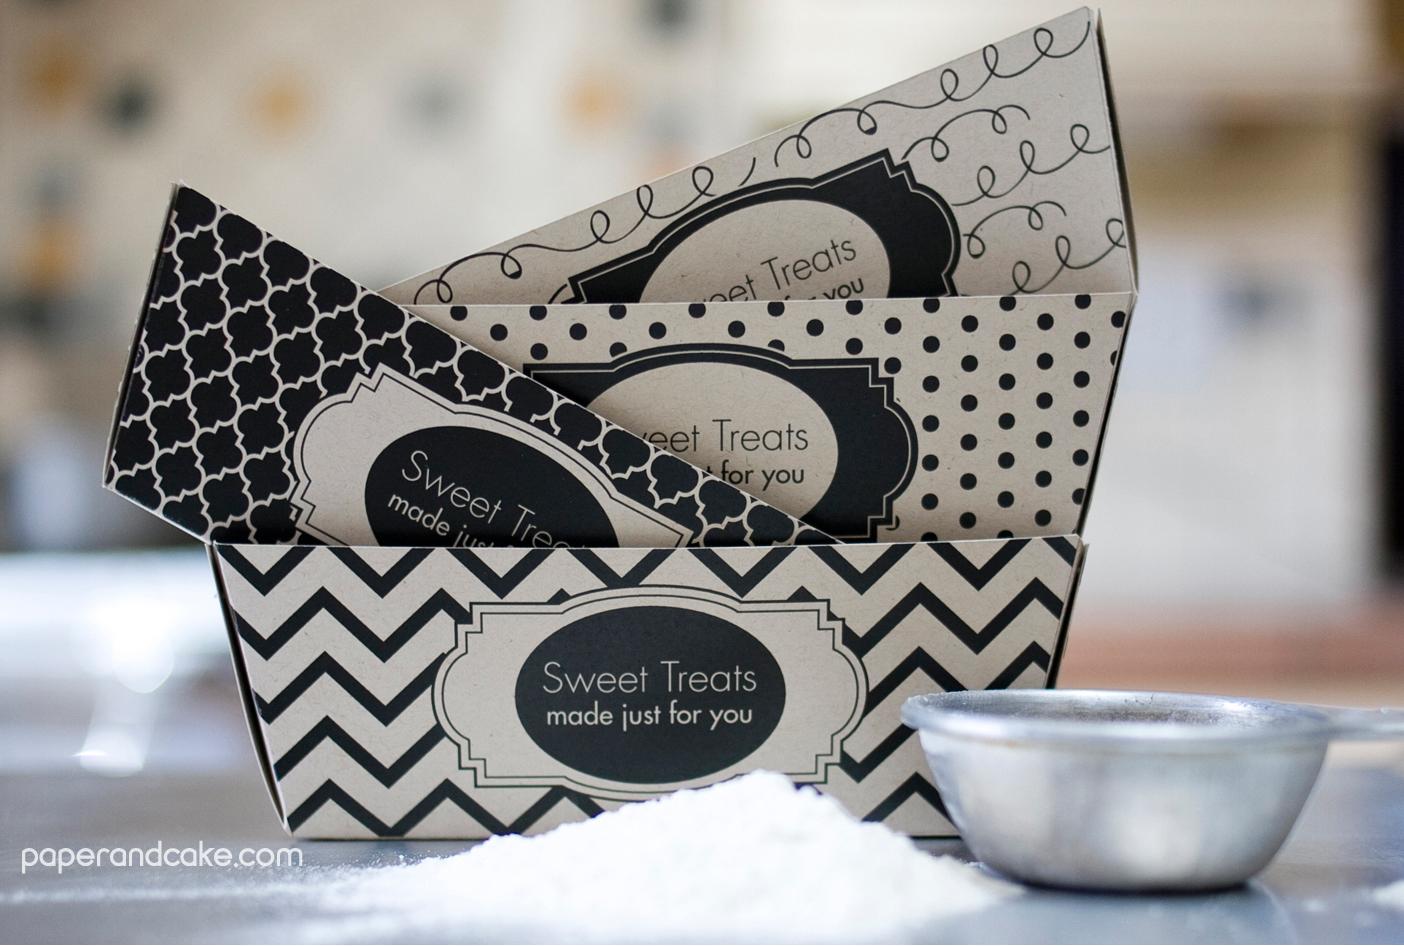 Sweet Treats Printable Baking Supplies